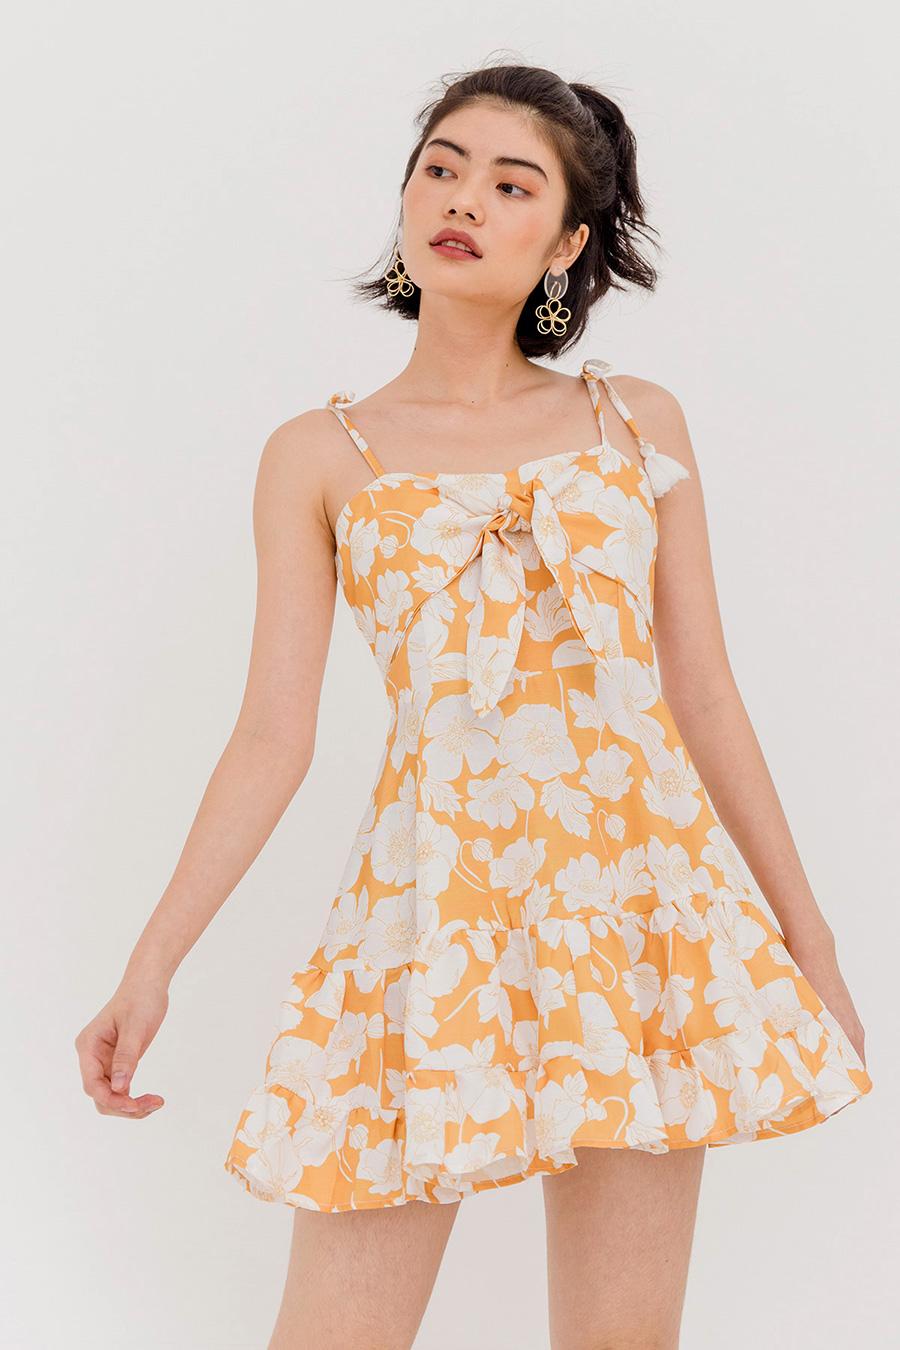 DELPHI FLORAL THIN STRAP DRESS - TANGERINE